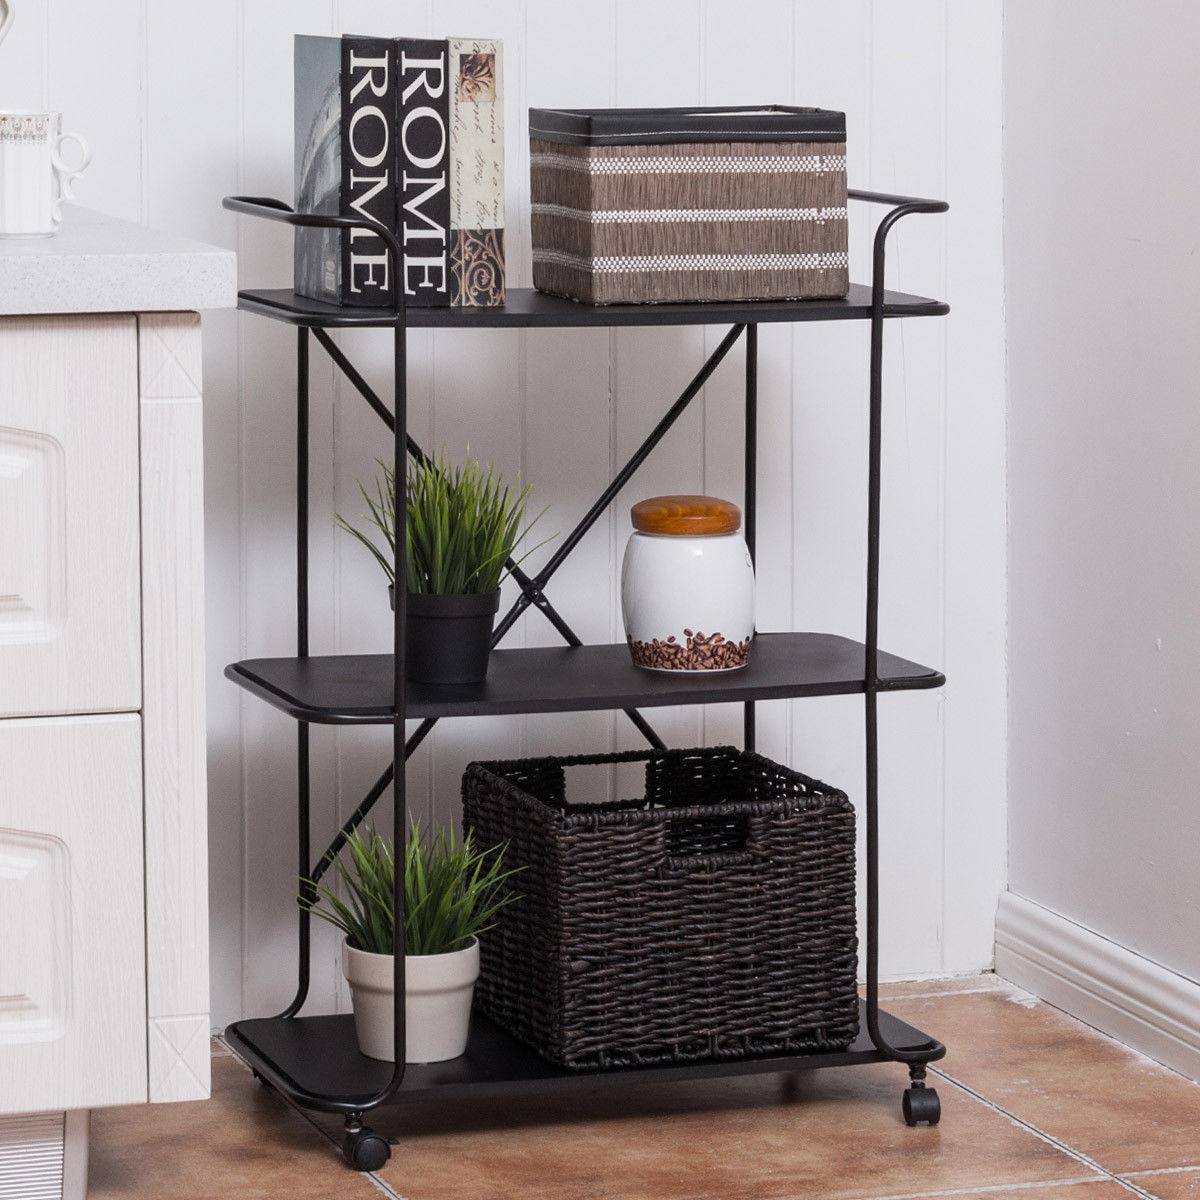 Giantex 3 Tier Metal Portable Rolling Cart Storage Rack Living Room Bookshelf Display Utility